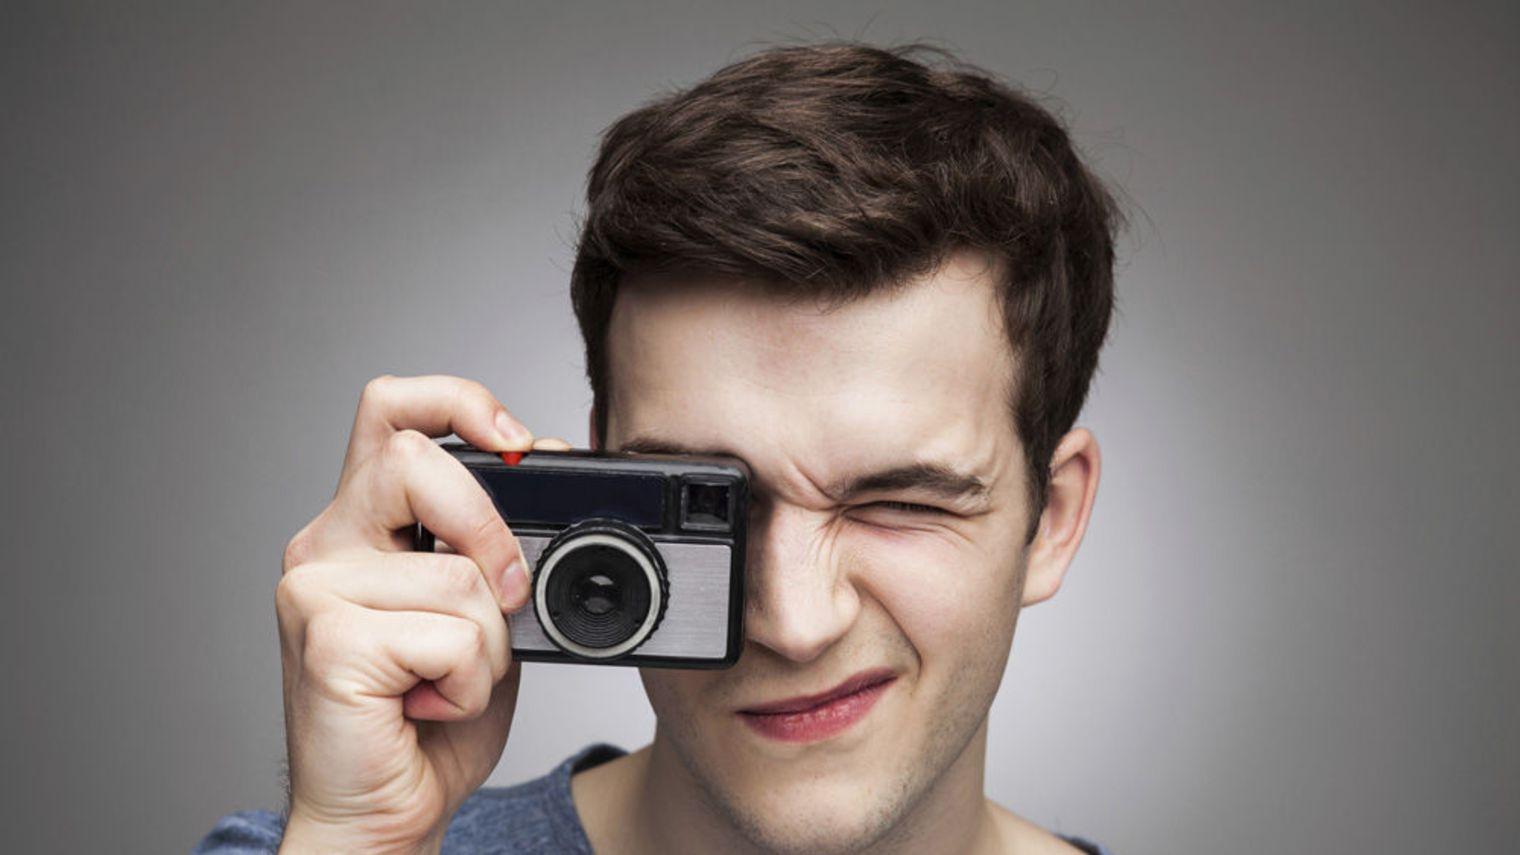 imagesBTS-photographie-77.jpg